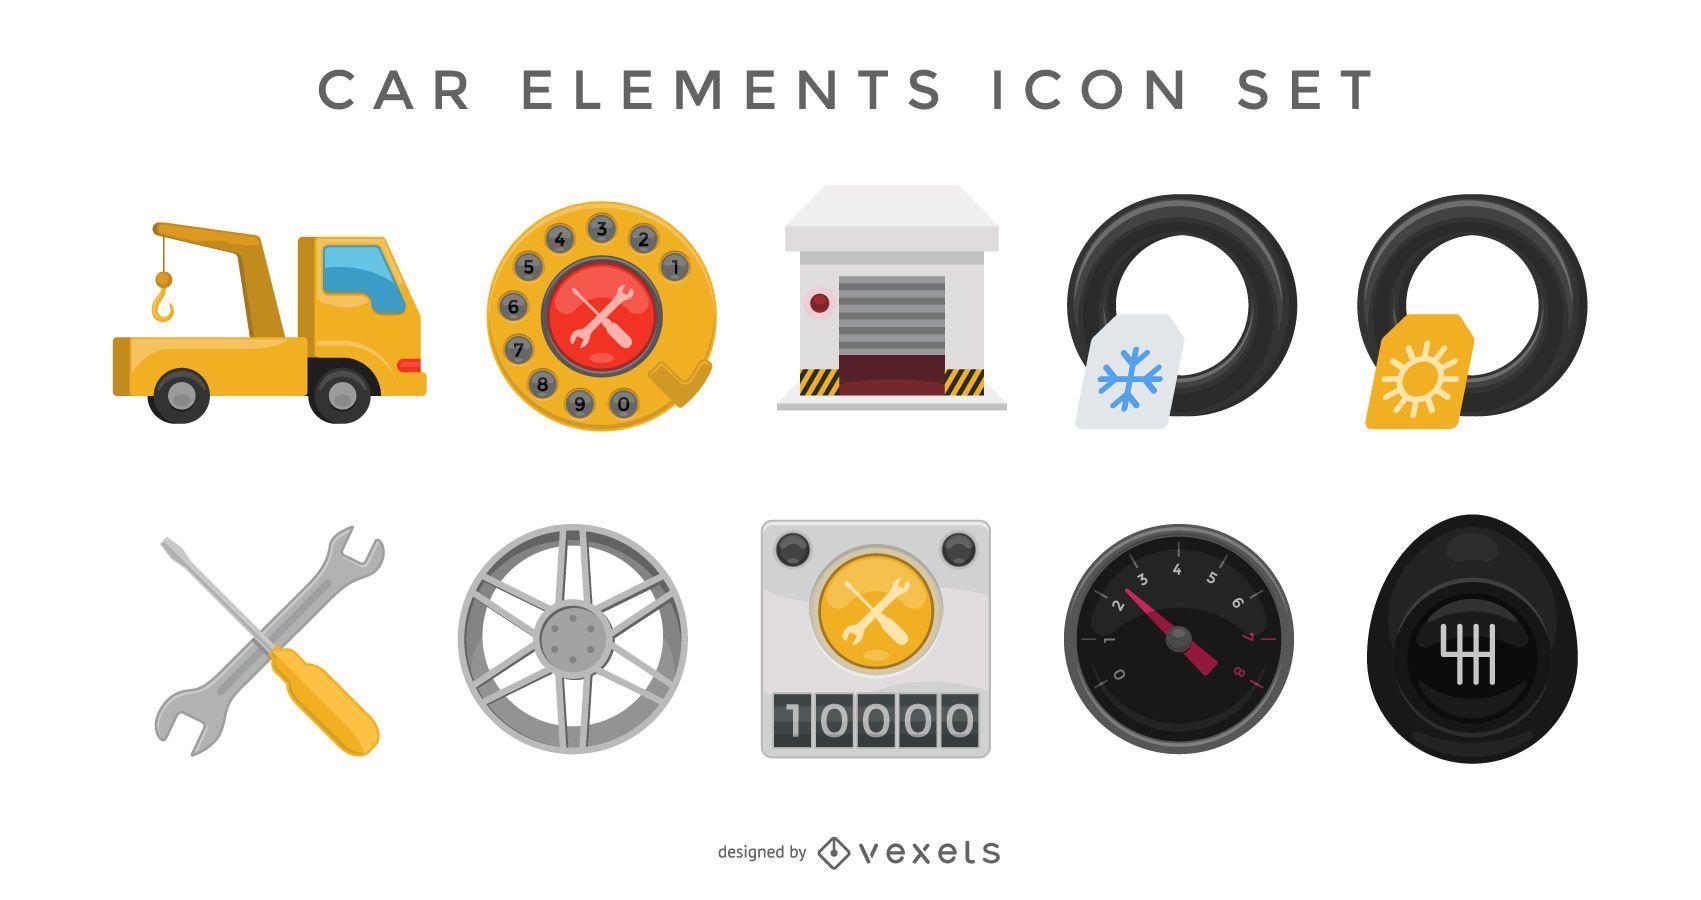 Car elements icon set